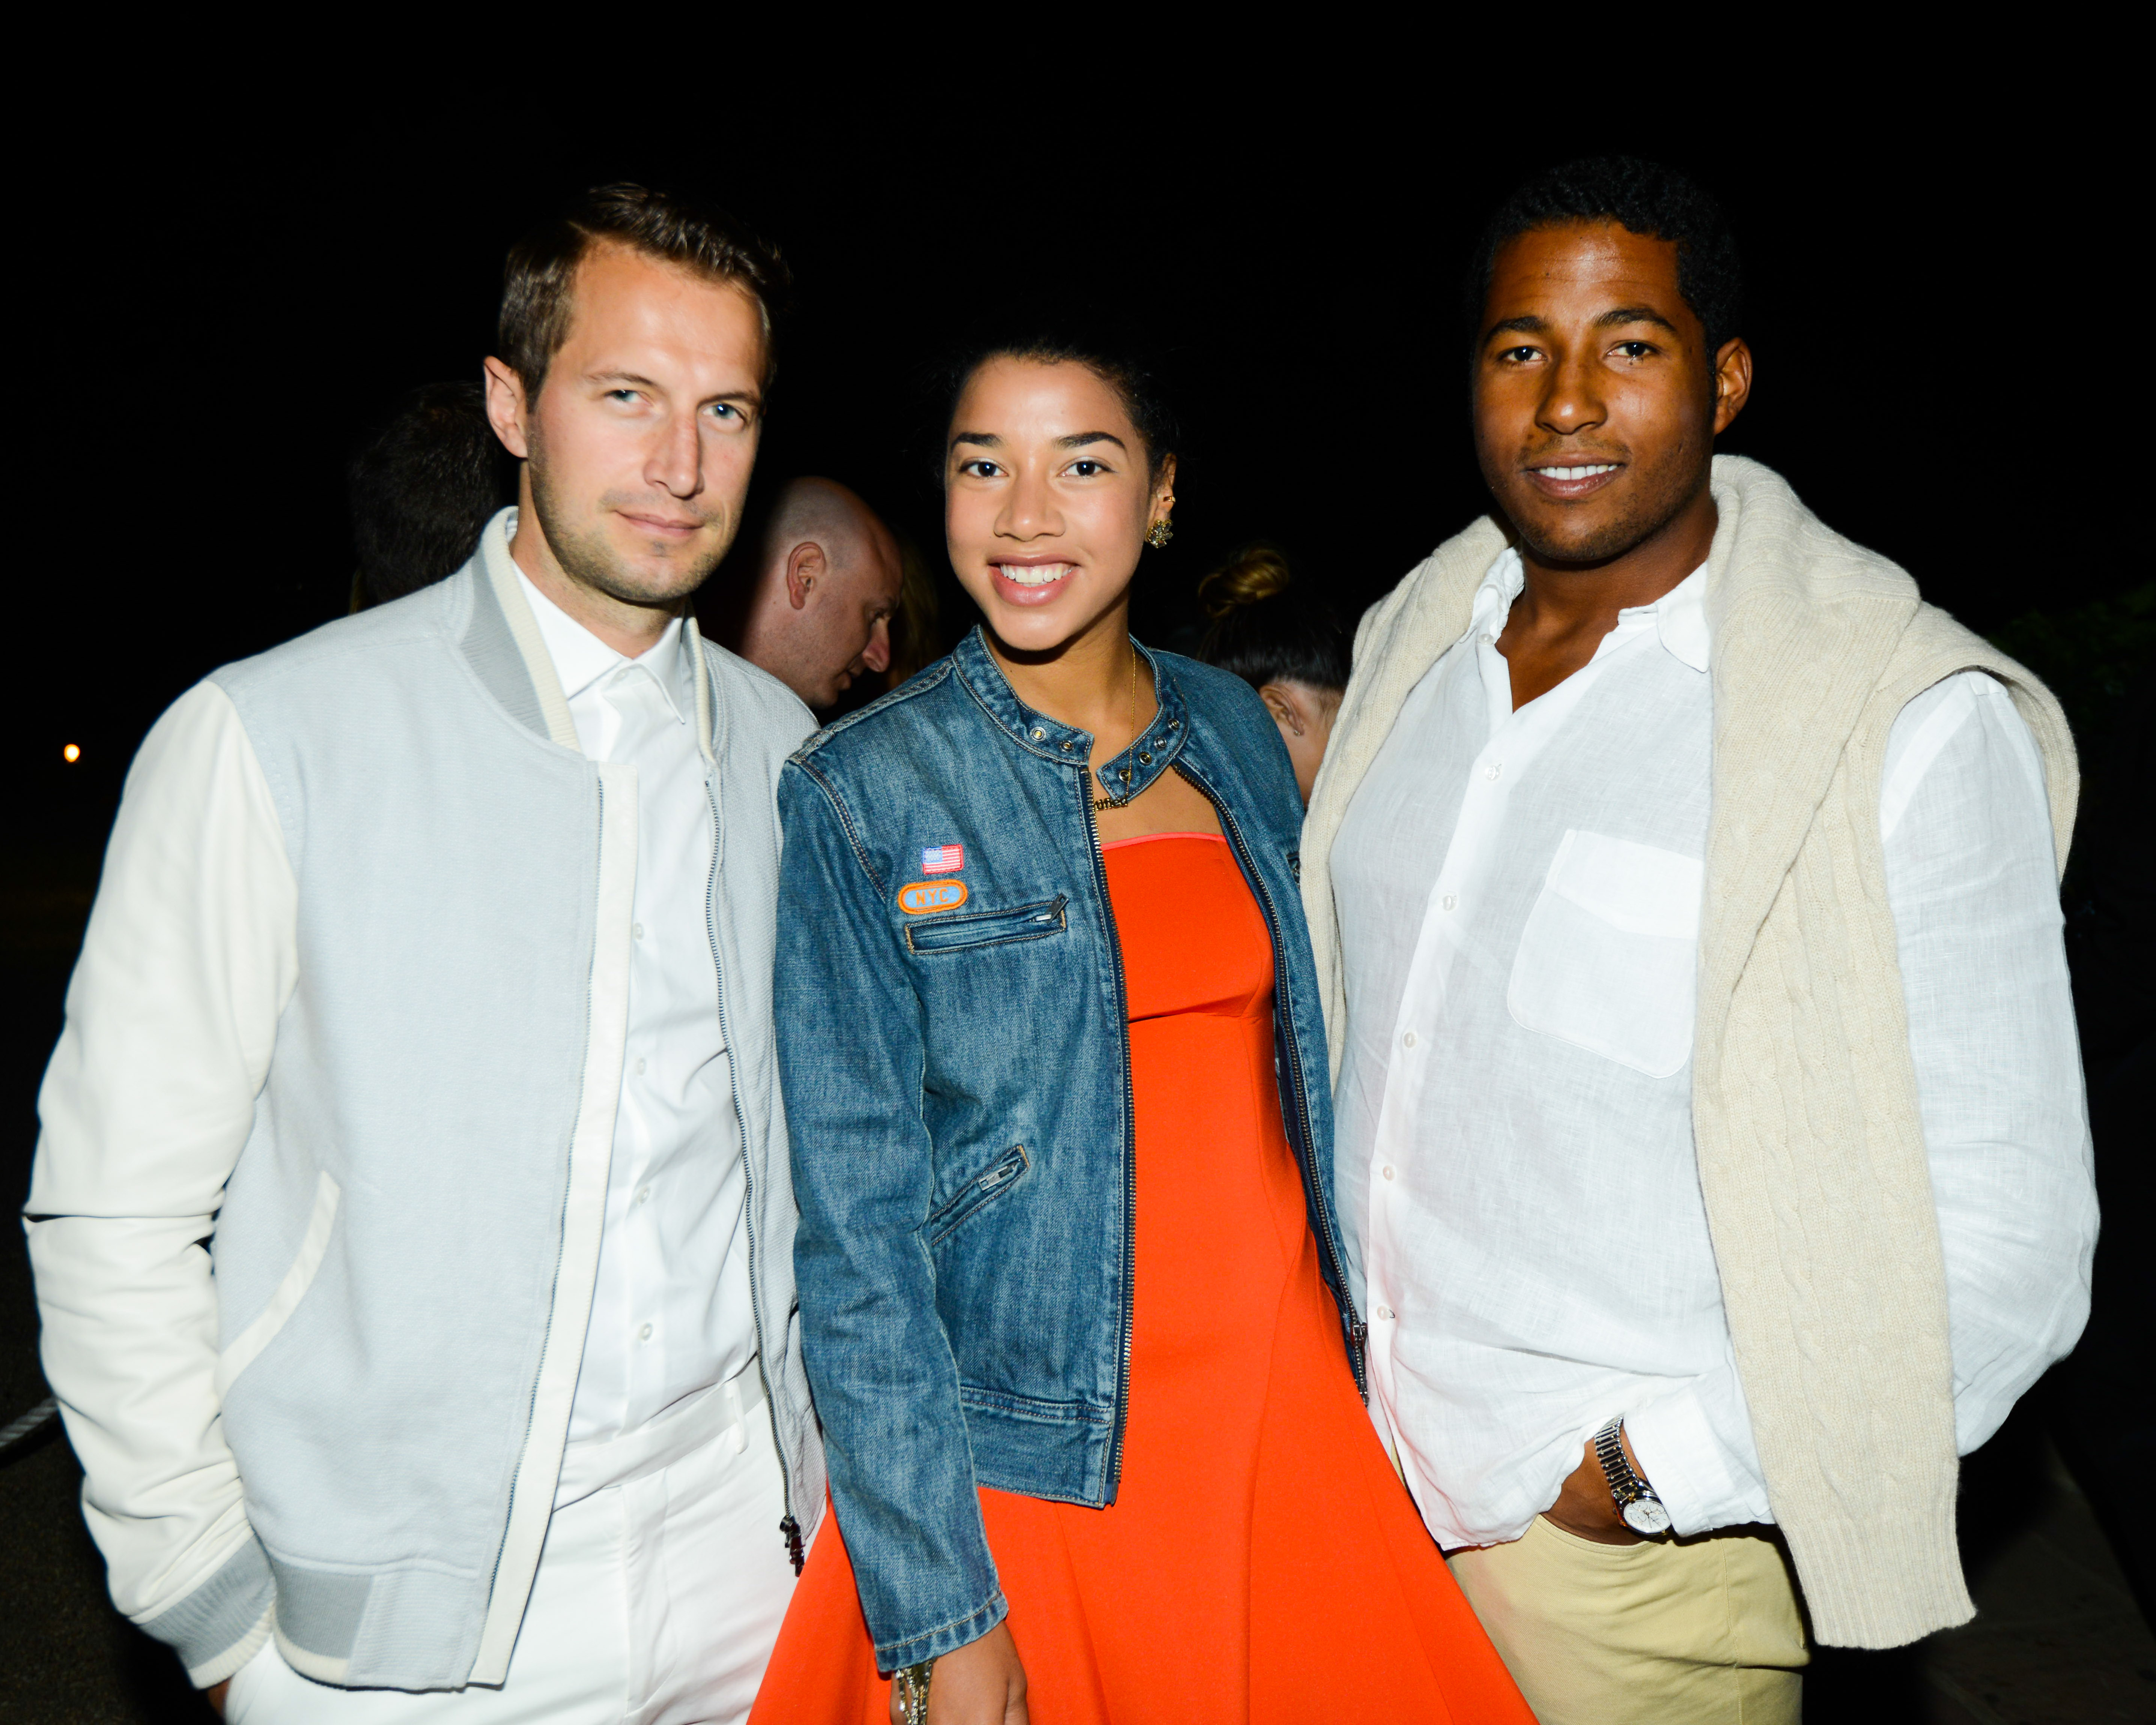 The Scene: DKNY & Hannah Bronfman Hamptons Benefit to